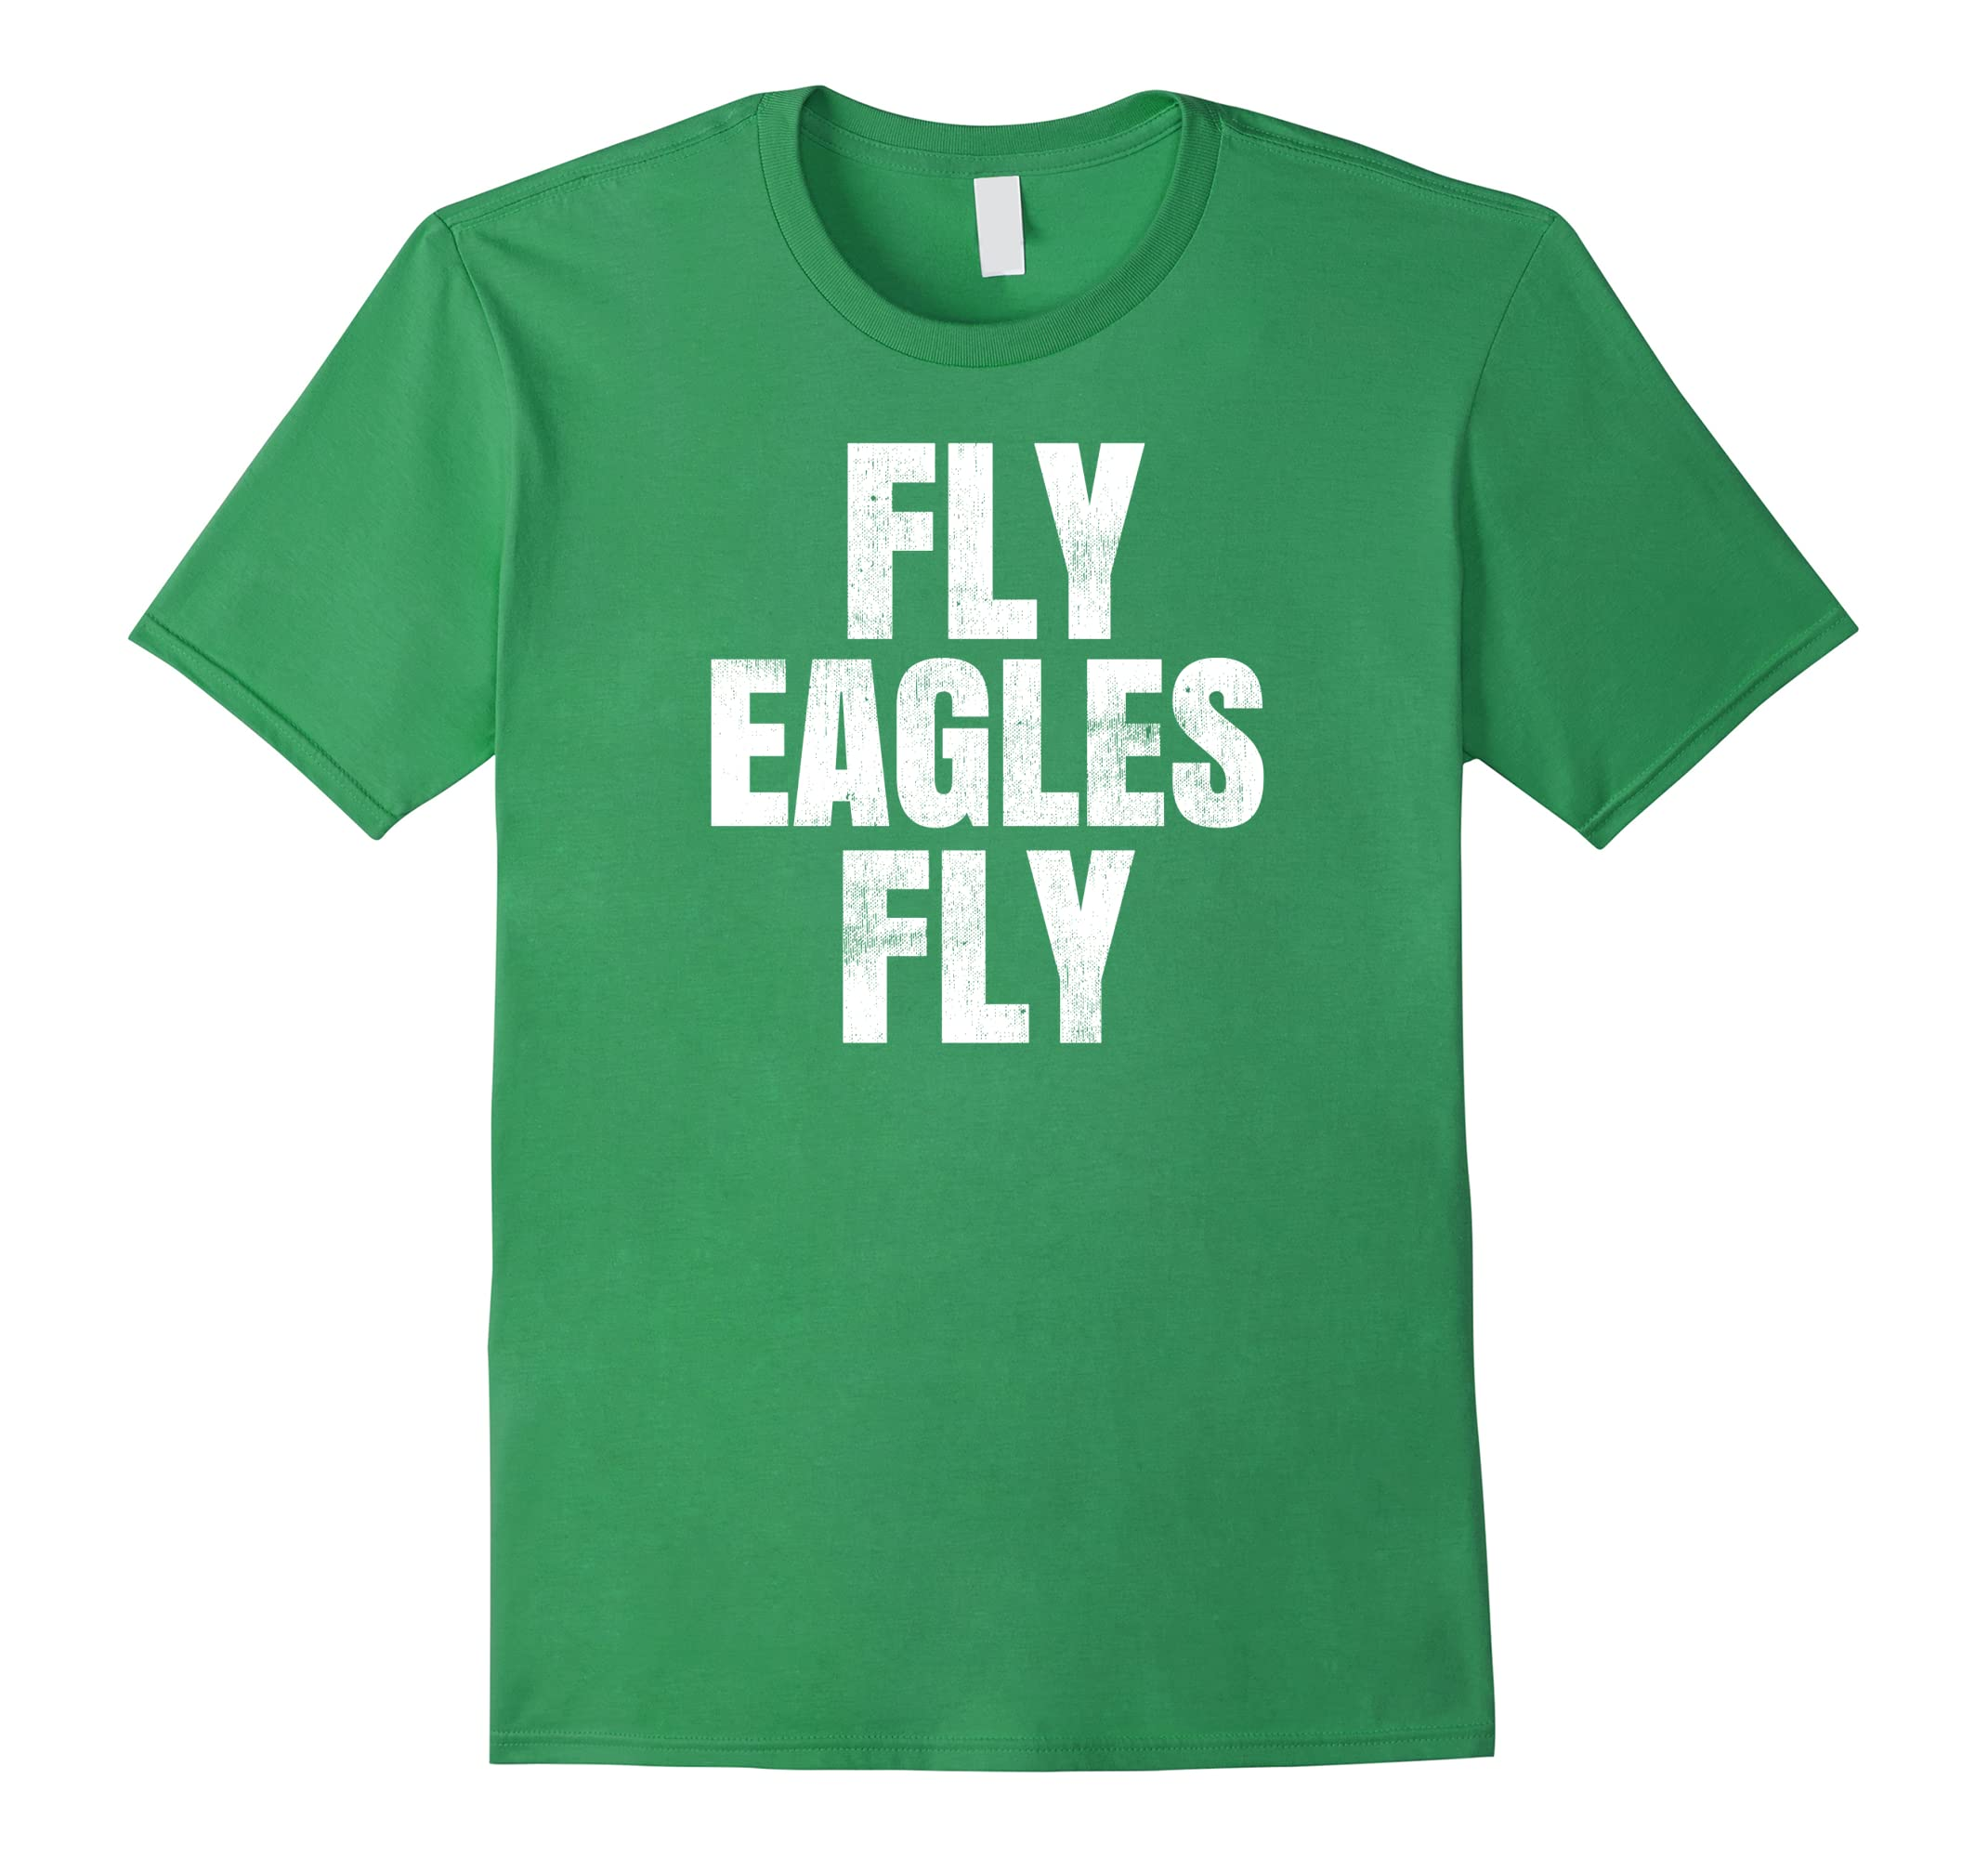 Fly Eagles Fly T Shirt ~ Flying Eagles TShirt Women Men Kids-ah my shirt one gift